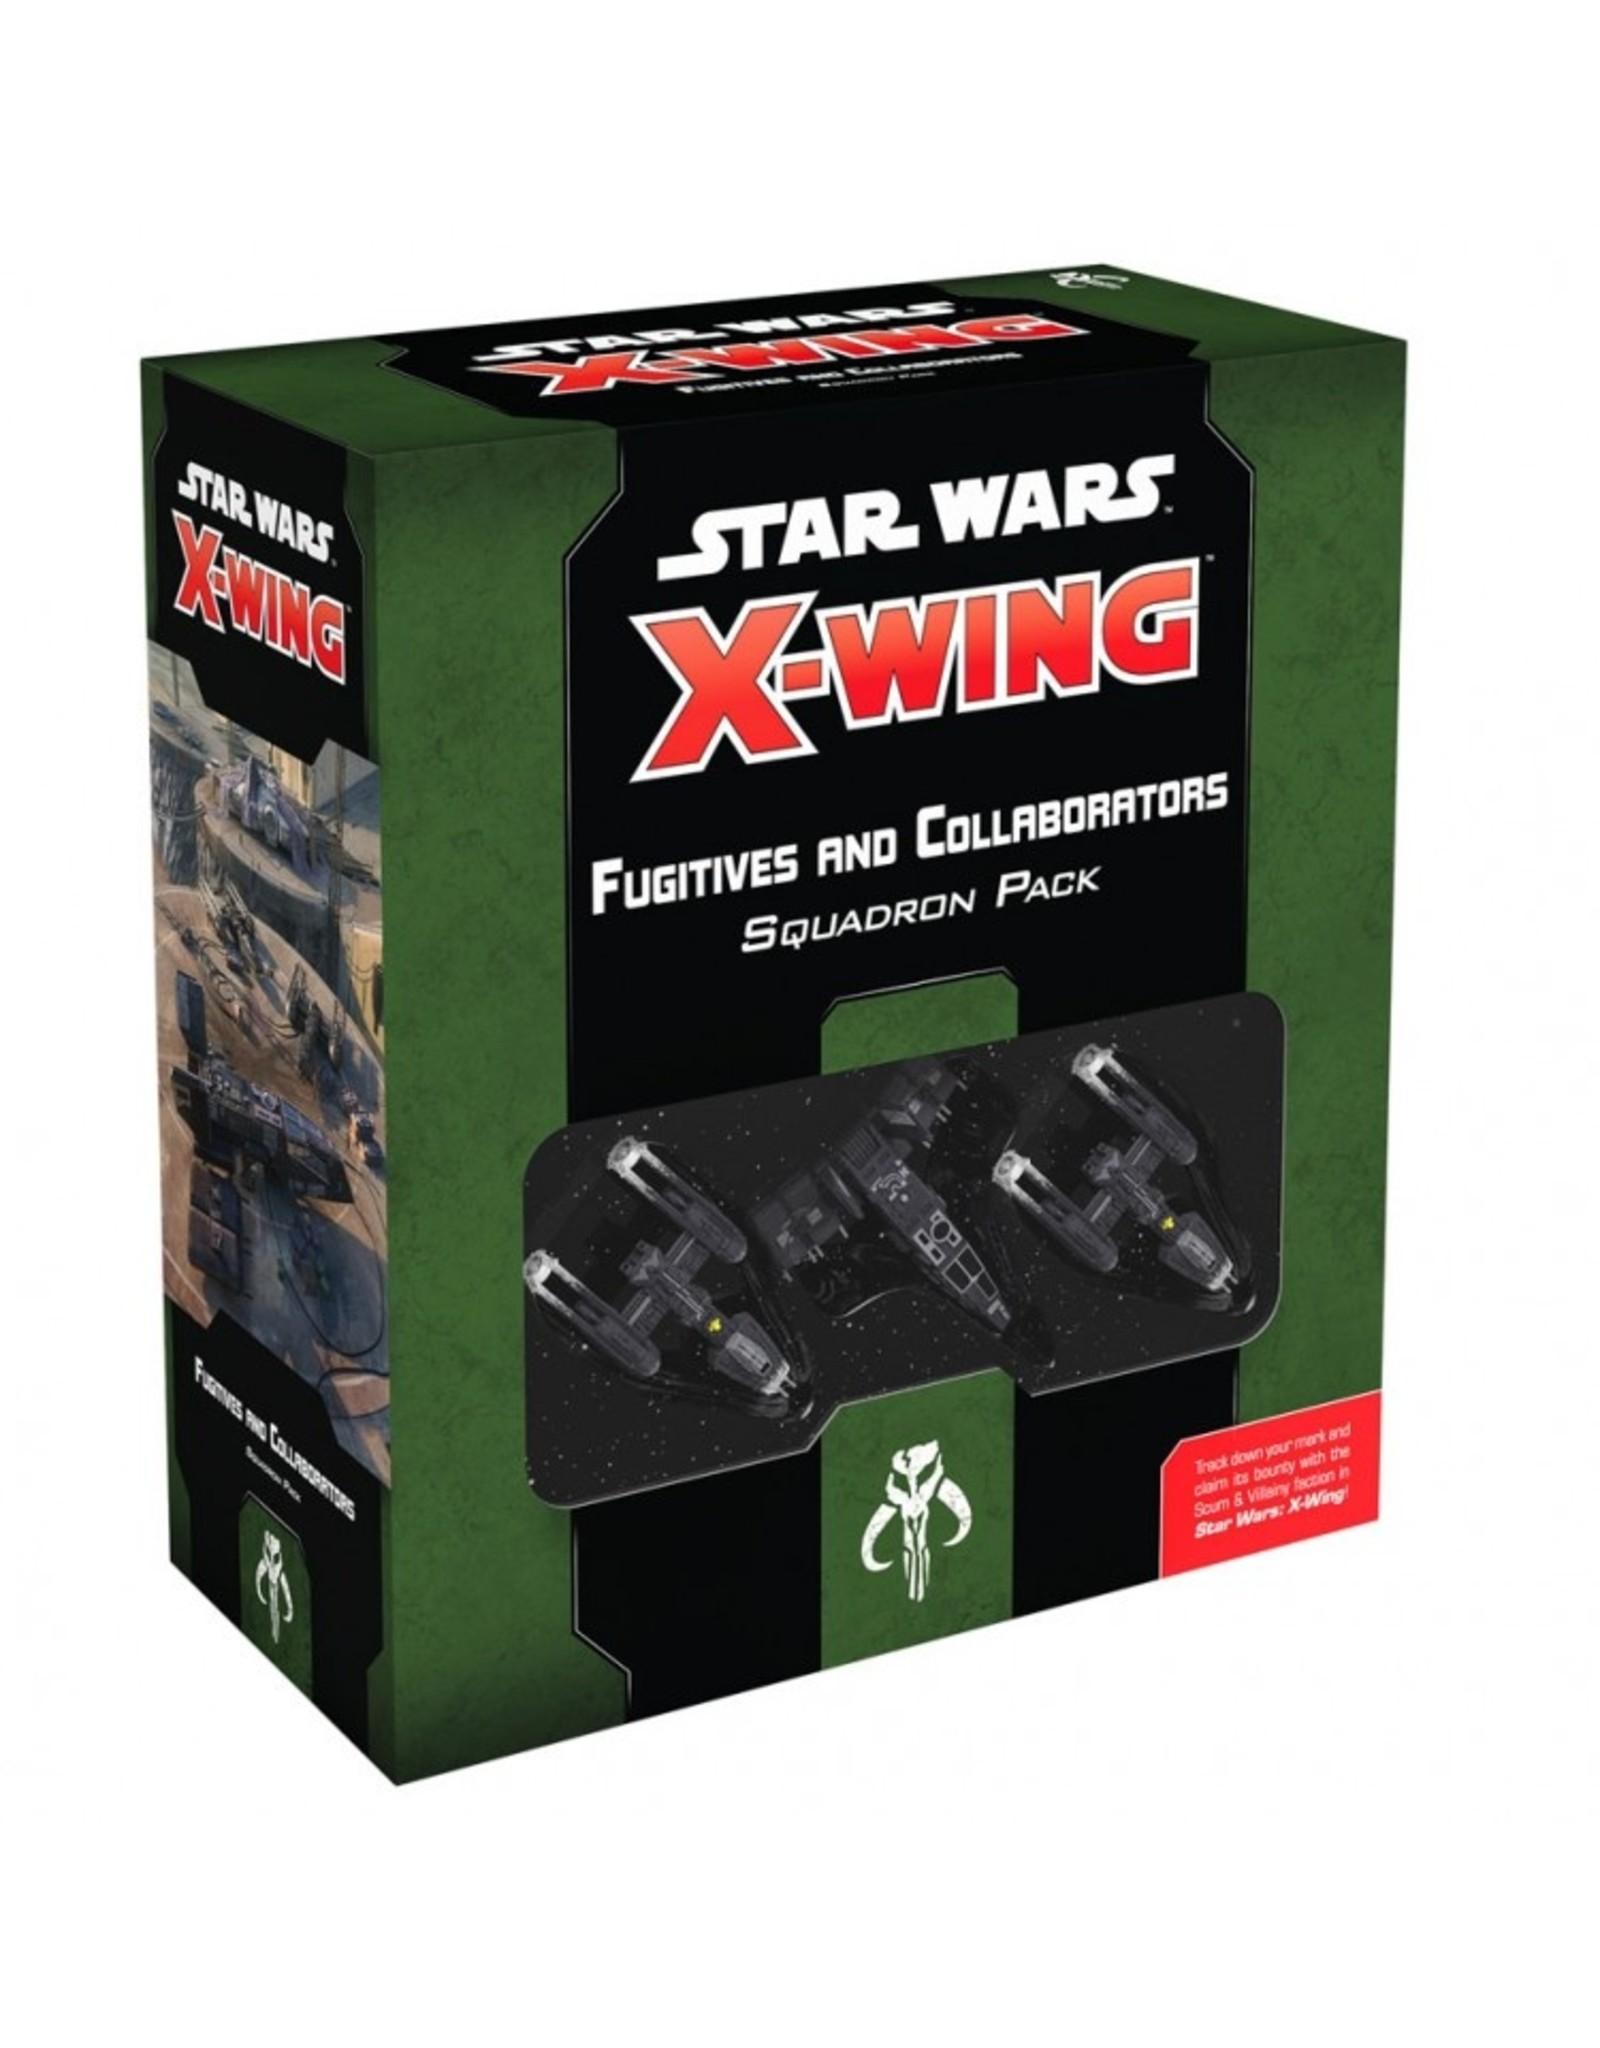 Atomic Mass Games Star Wars X-Wing 2E: Fugitives & Collaborators